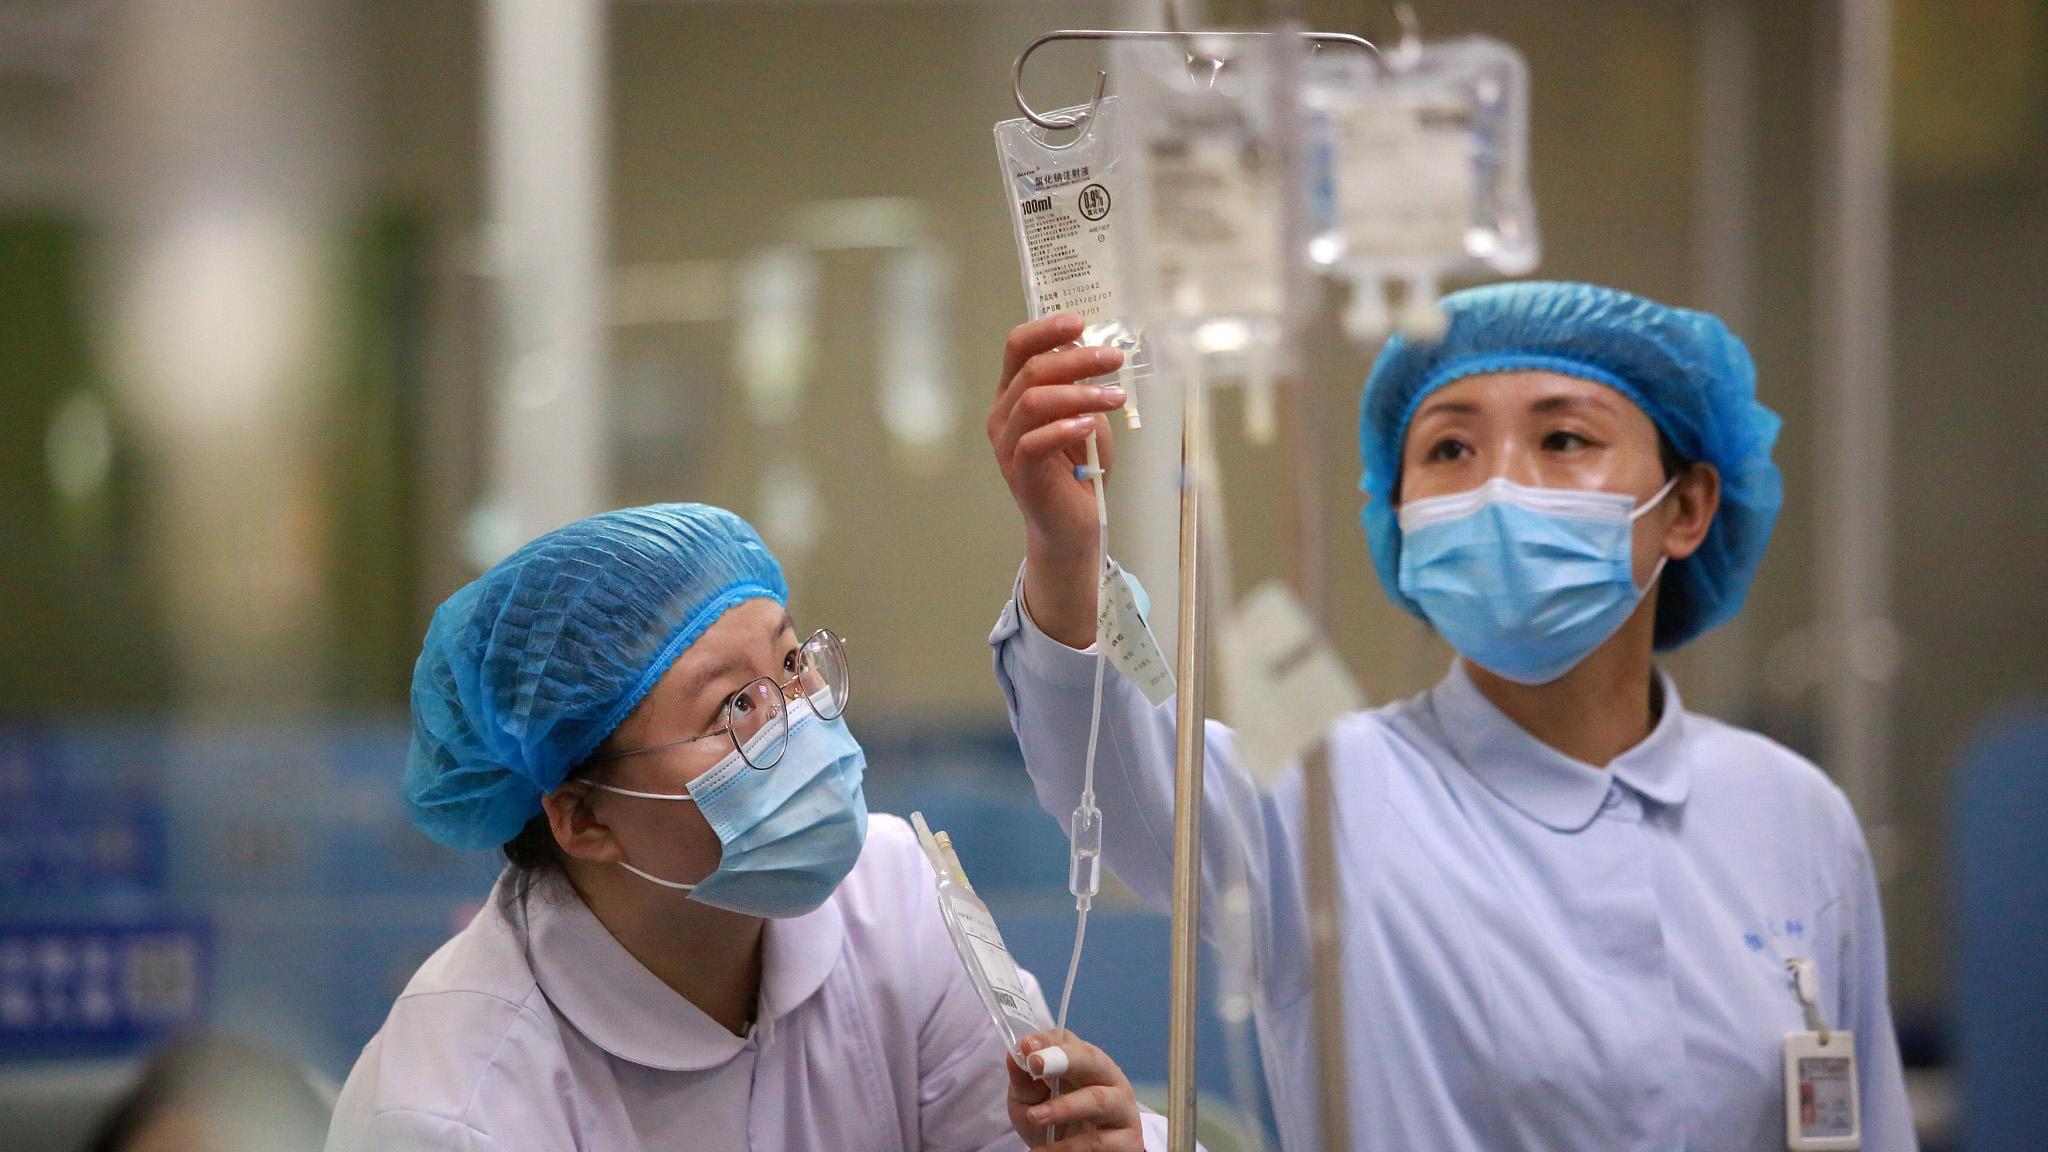 international nurses day 2021 - photo #25